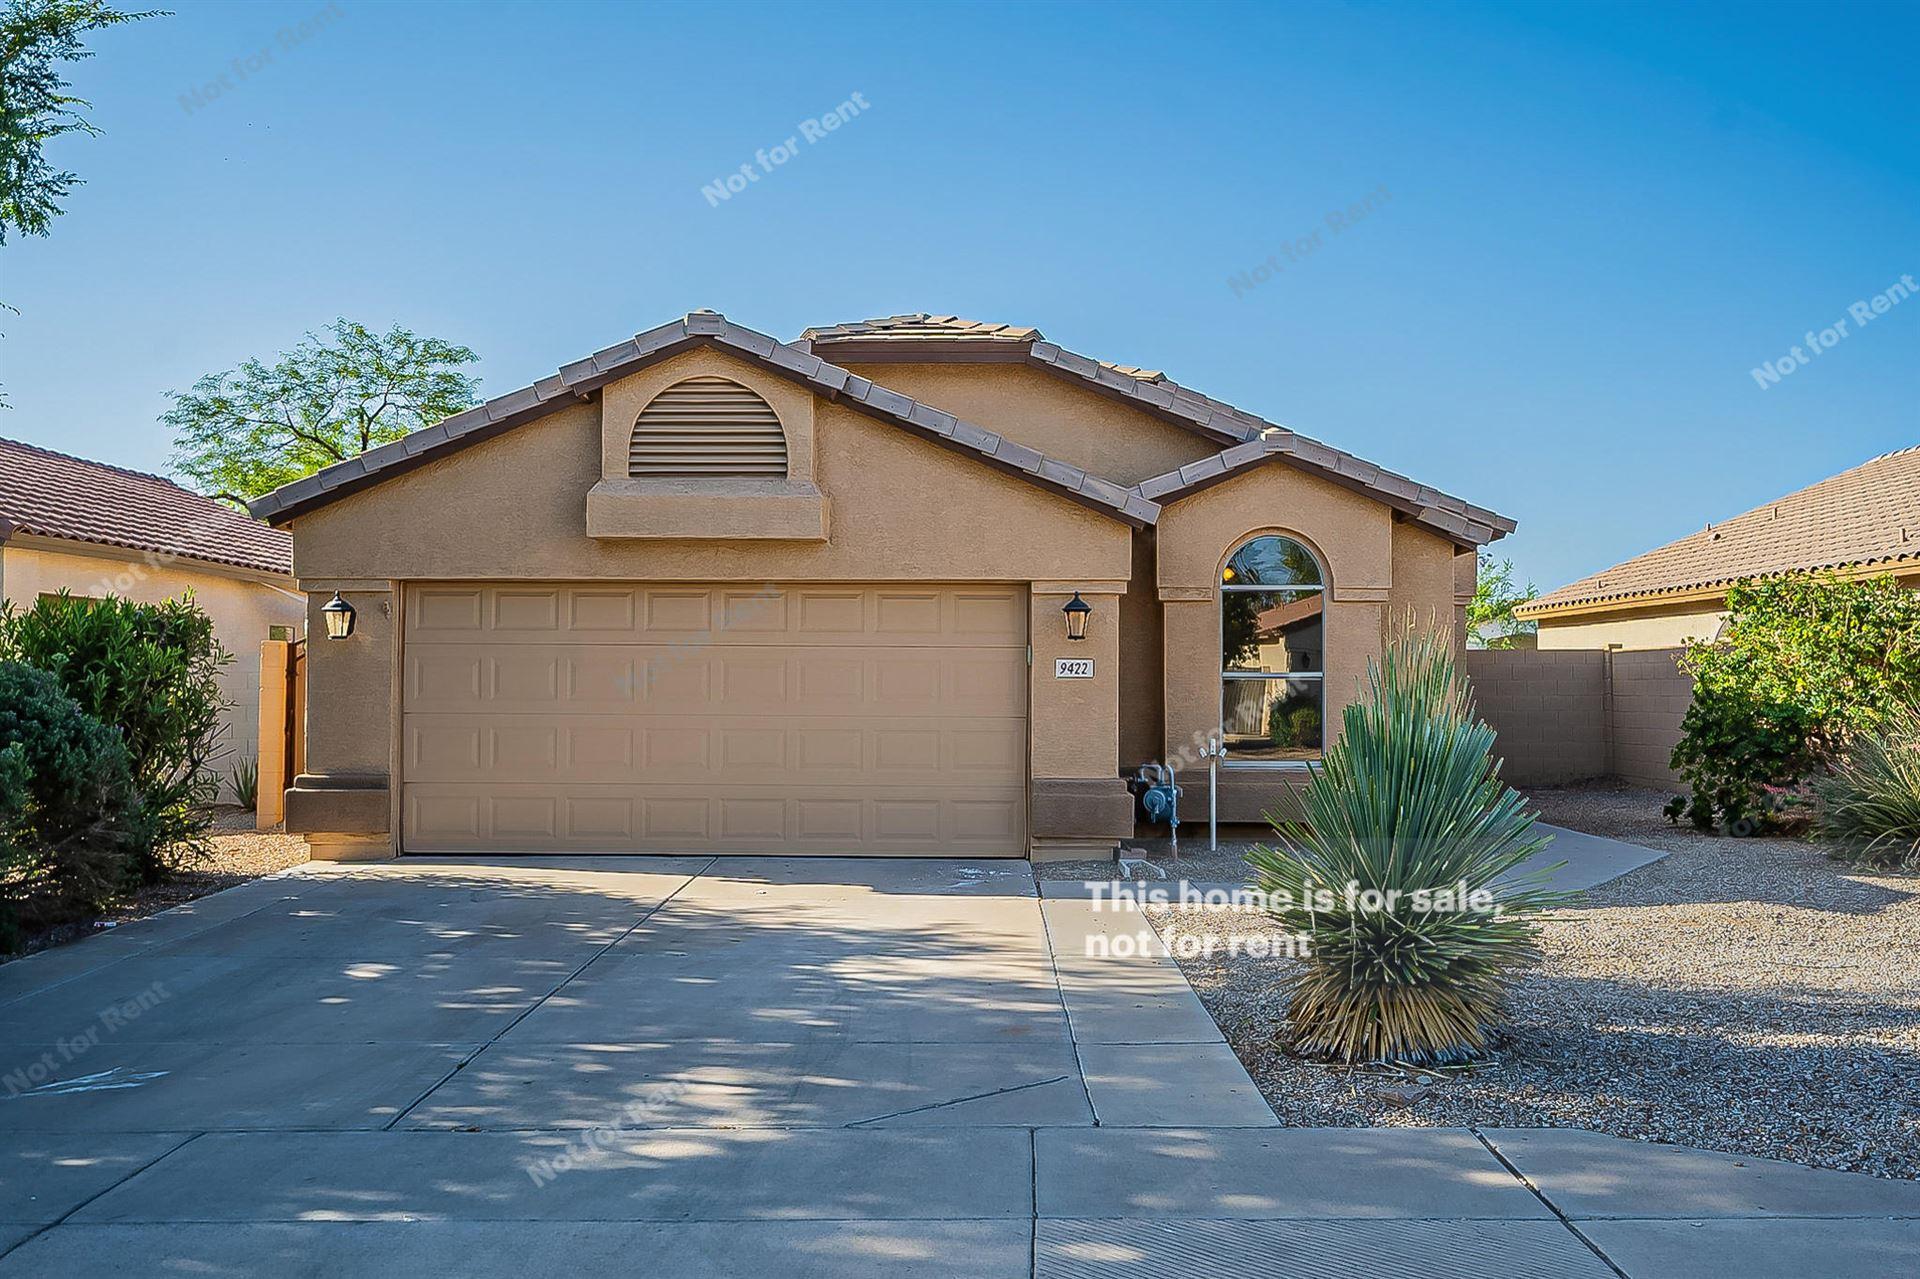 9422 E PAMPA Avenue, Mesa, AZ 85212 - MLS#: 6235234